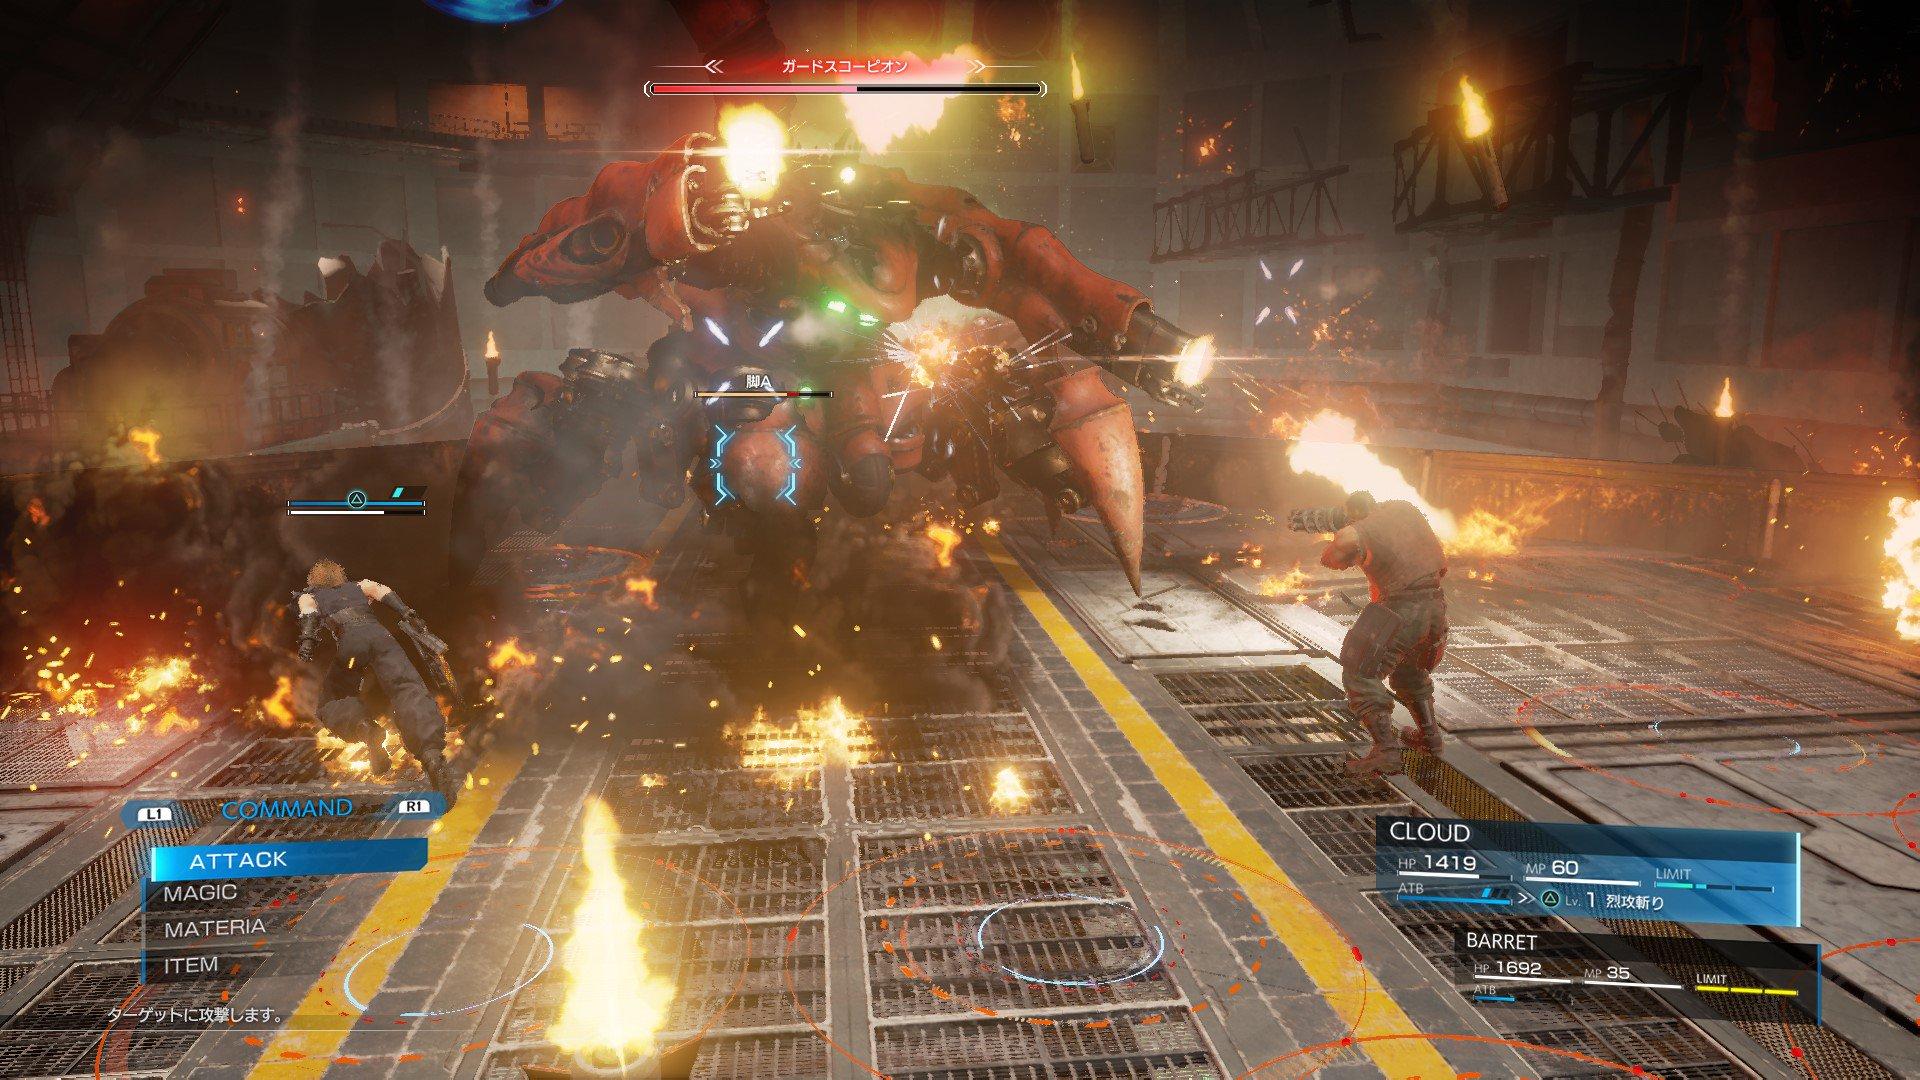 Final Fantasy VII Remake And Kingdom Hearts III Screenshots Released Capsule Computers